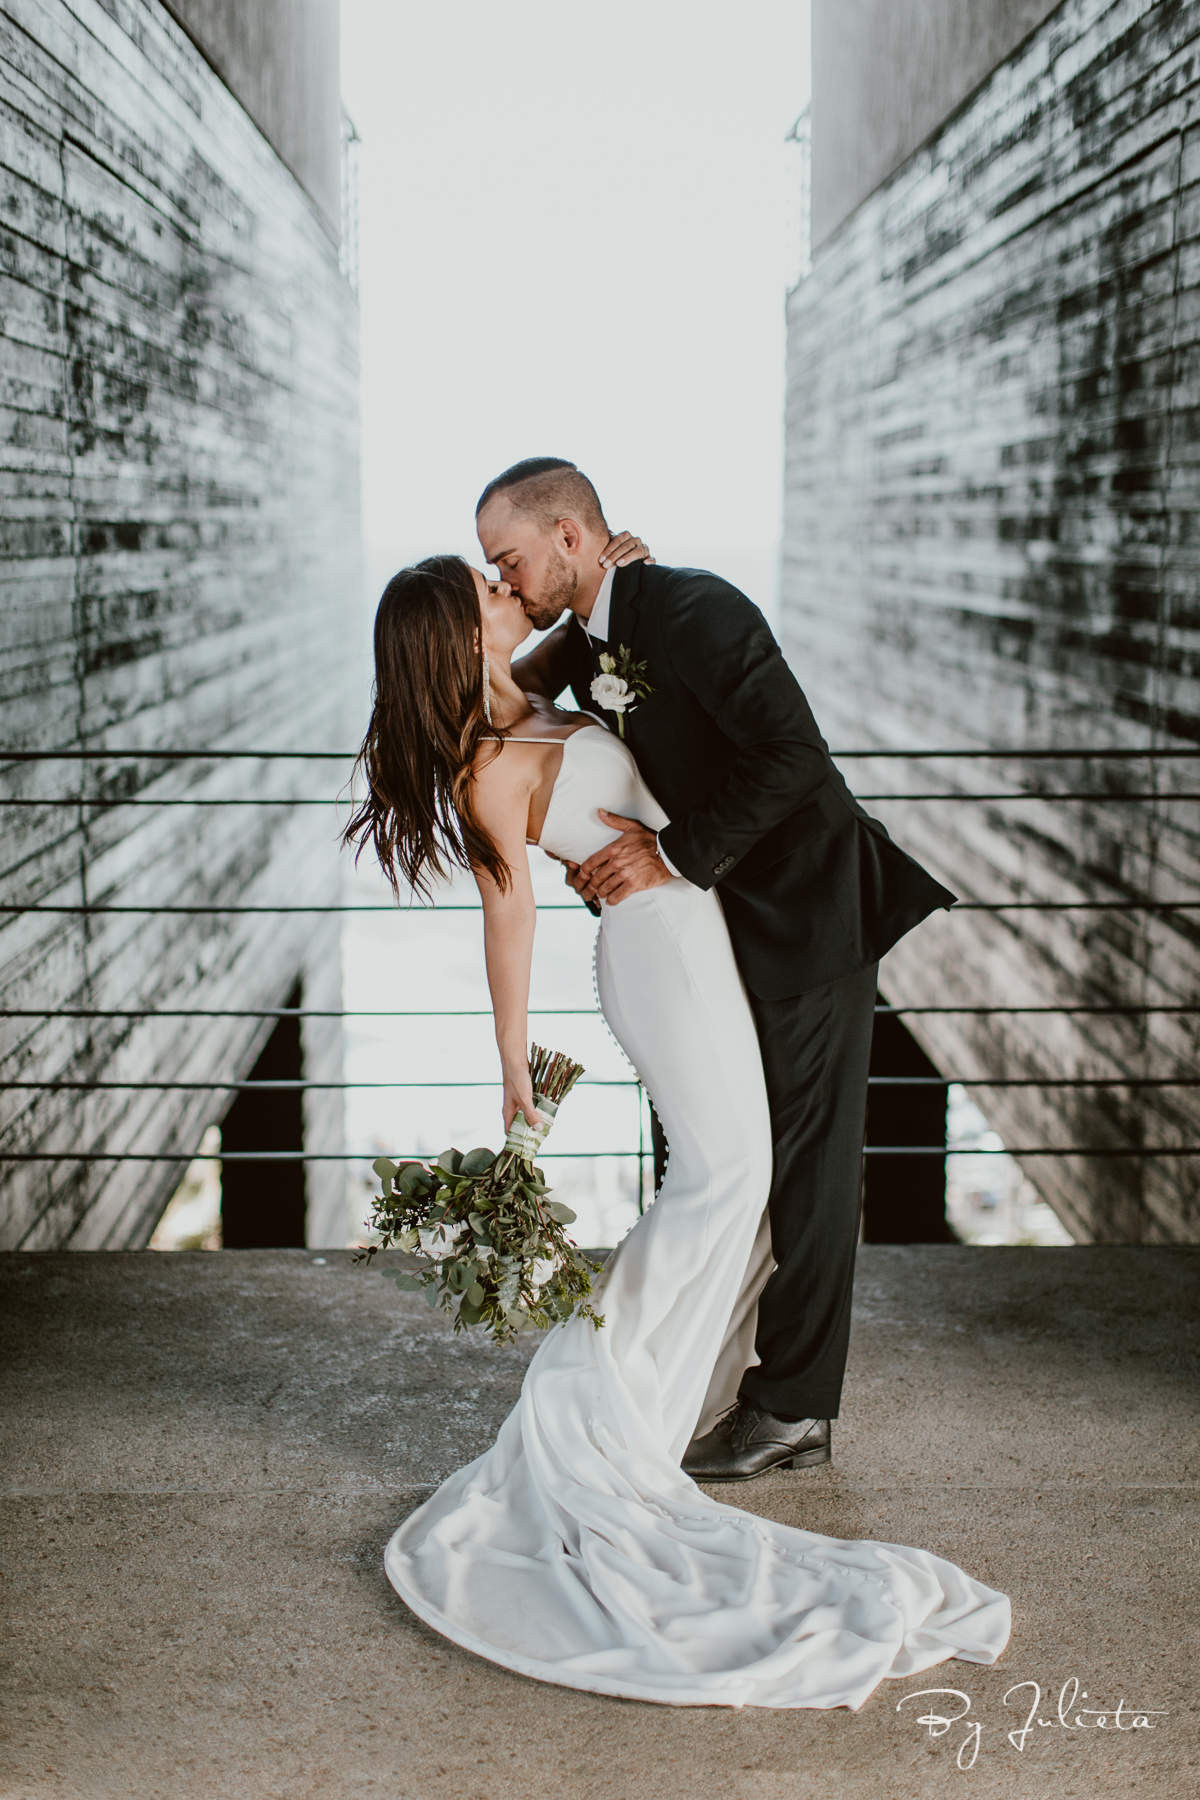 WeddingTheCapeCabo.B+G.JulietaAmezcuaPhotography.(212of533).jpg